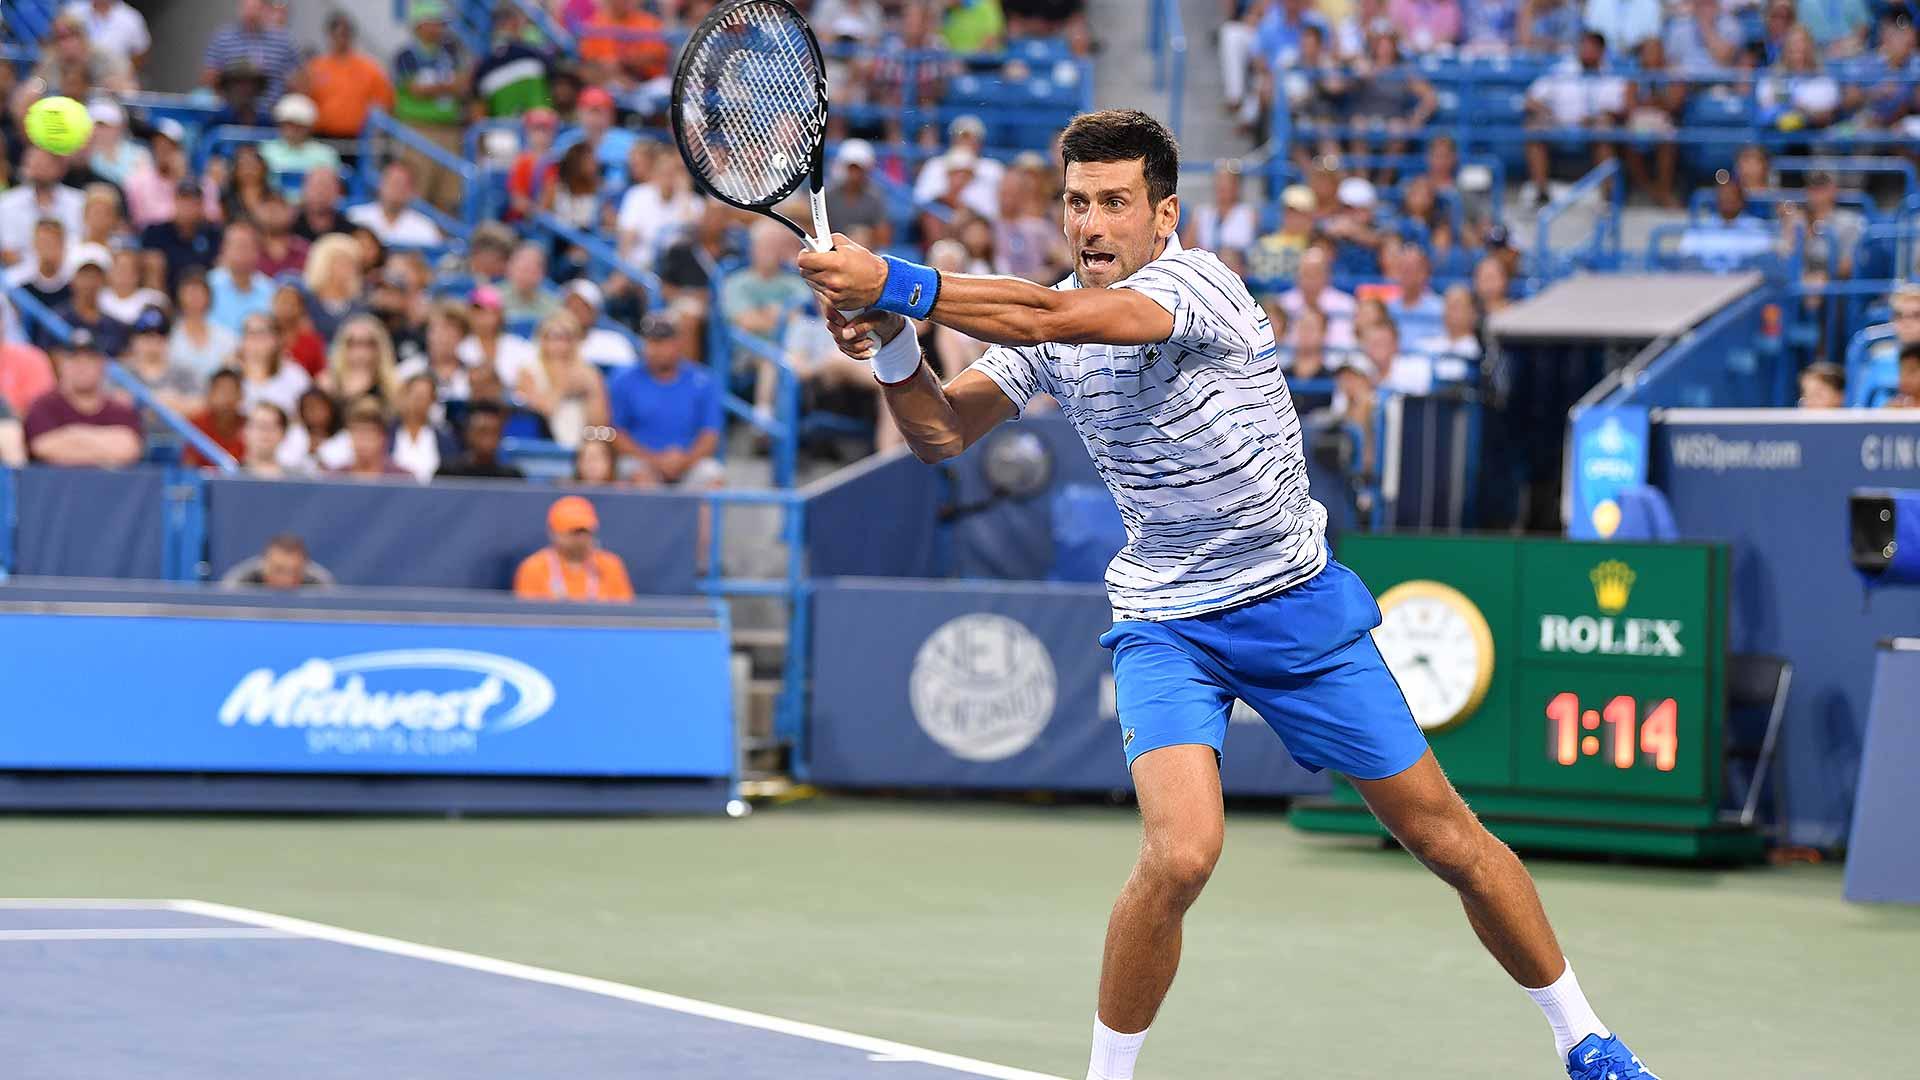 <a href='https://www.atptour.com/en/players/novak-djokovic/d643/overview'>Novak Djokovic</a> saves all four break points faced on Thursday against <a href='https://www.atptour.com/en/players/pablo-carreno-busta/cd85/overview'>Pablo Carreno Busta</a> in Cincinnati.